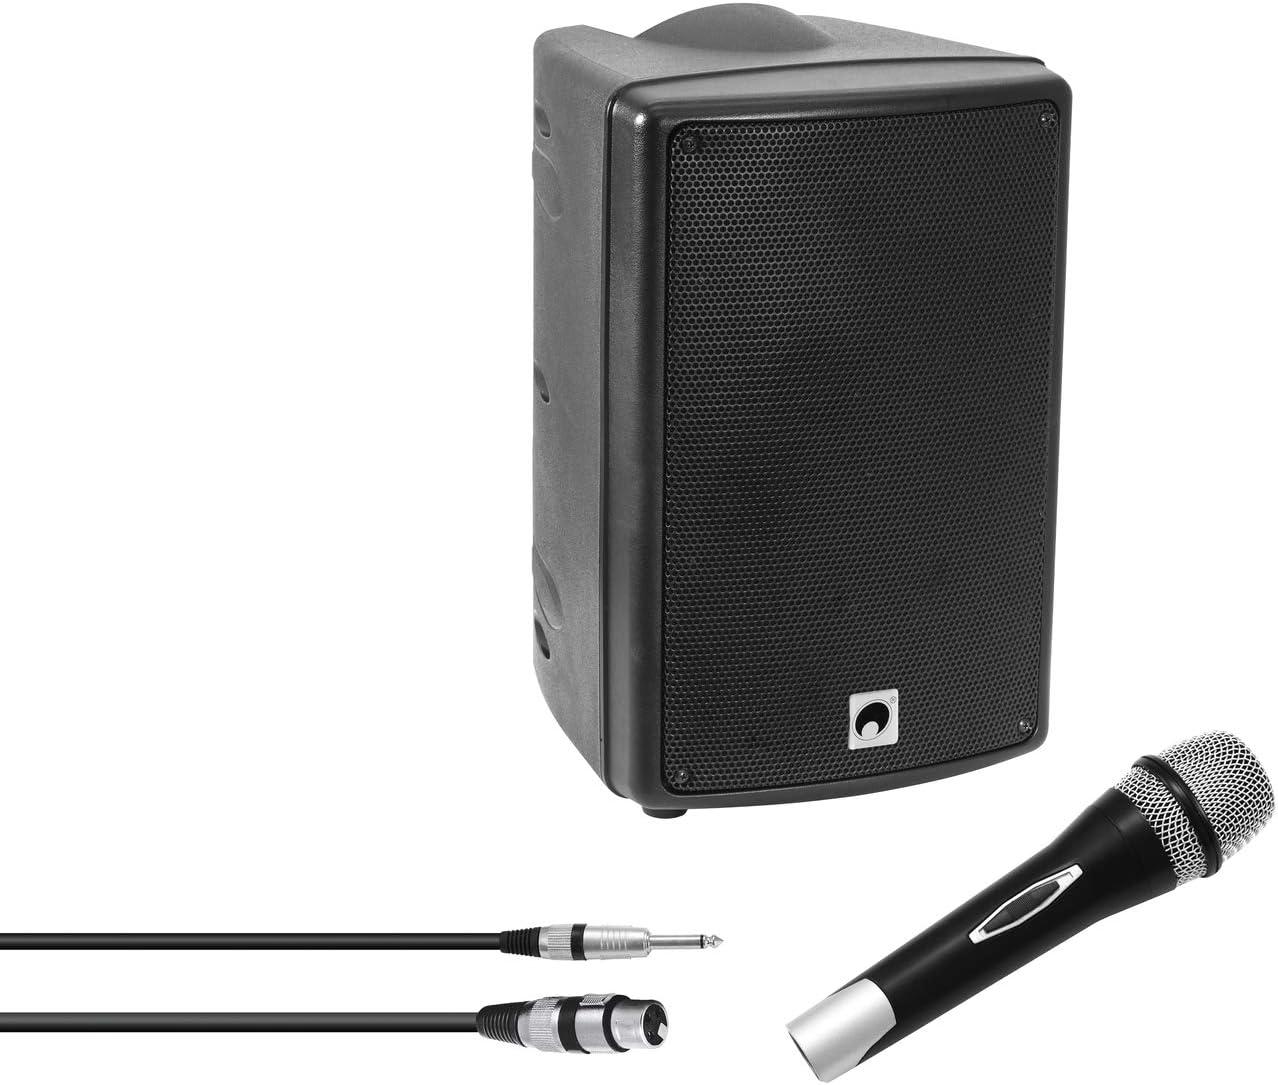 Partymic-1 OMNITRONIC Set WMAS-08BT MK2 Wireless PA System